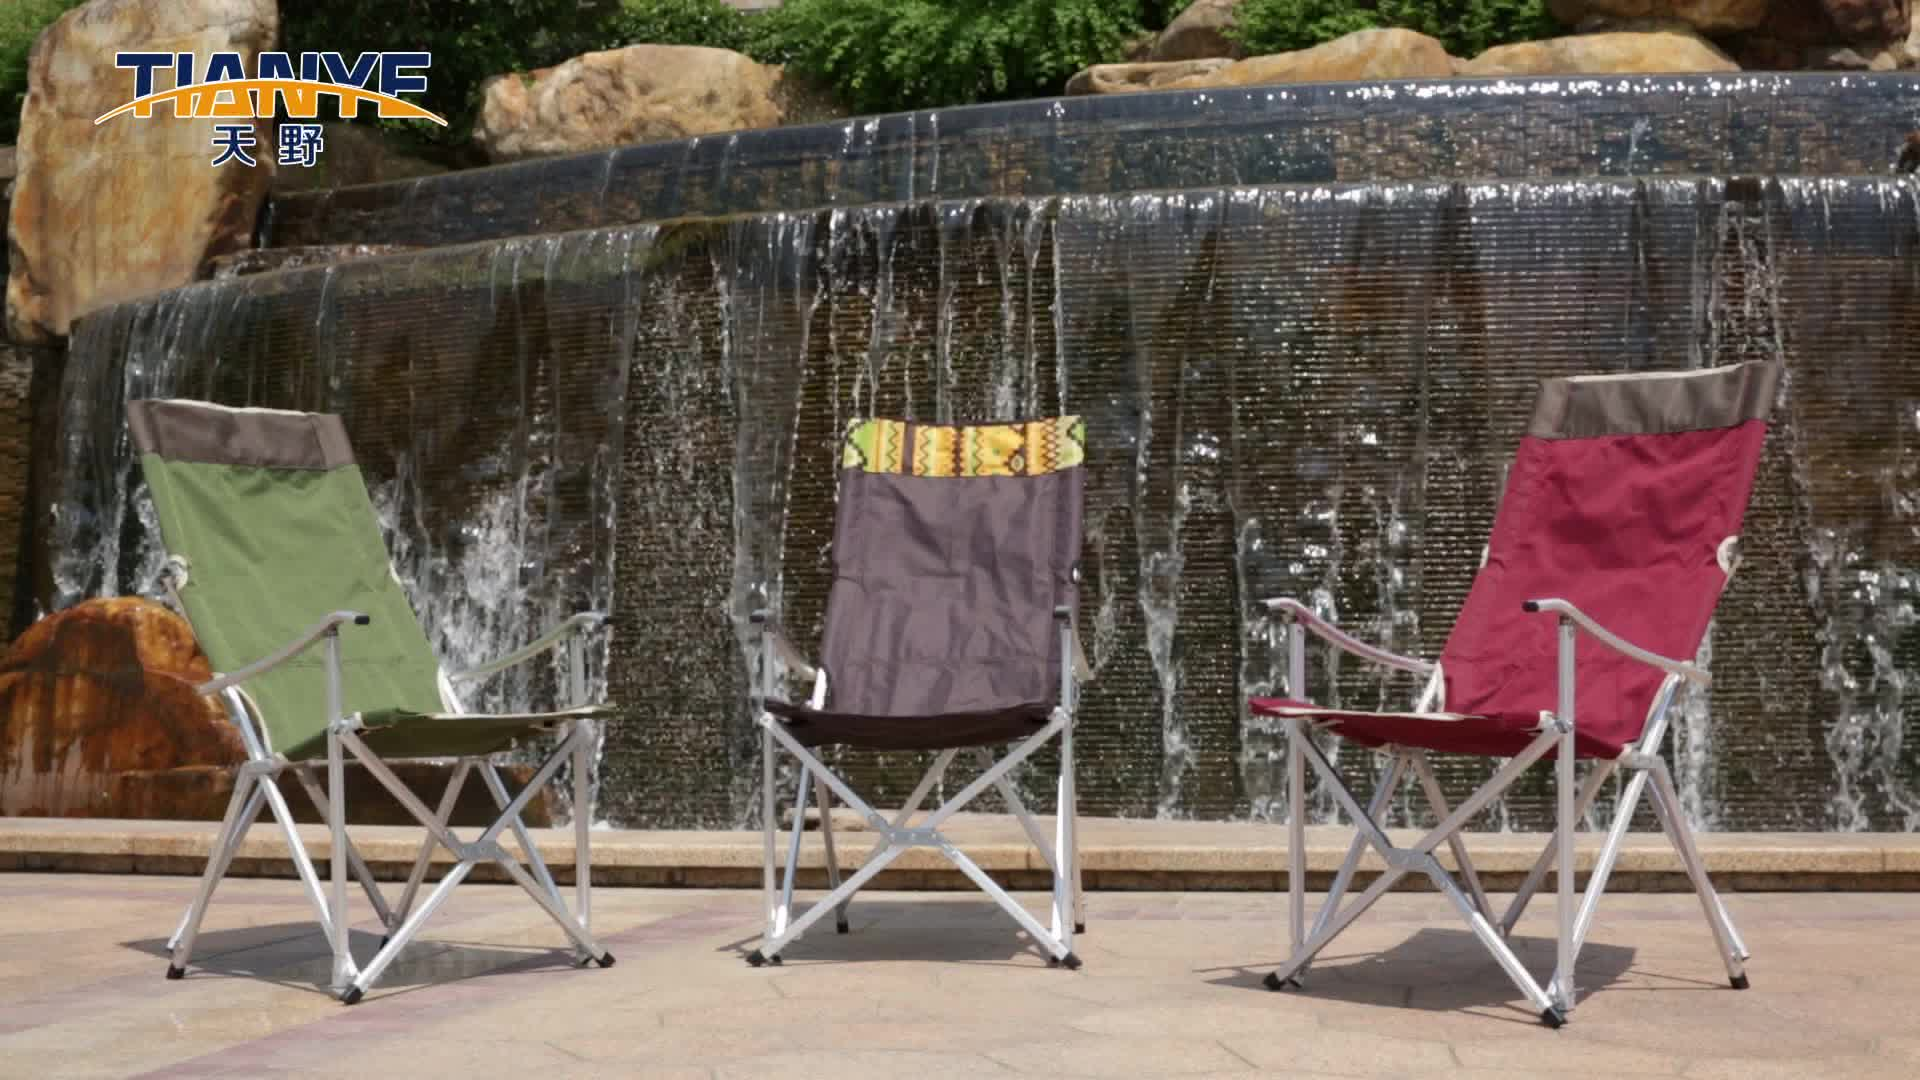 Tianye metal Outdoor metal furniture  relax Picnic Fishing Folding camping chair